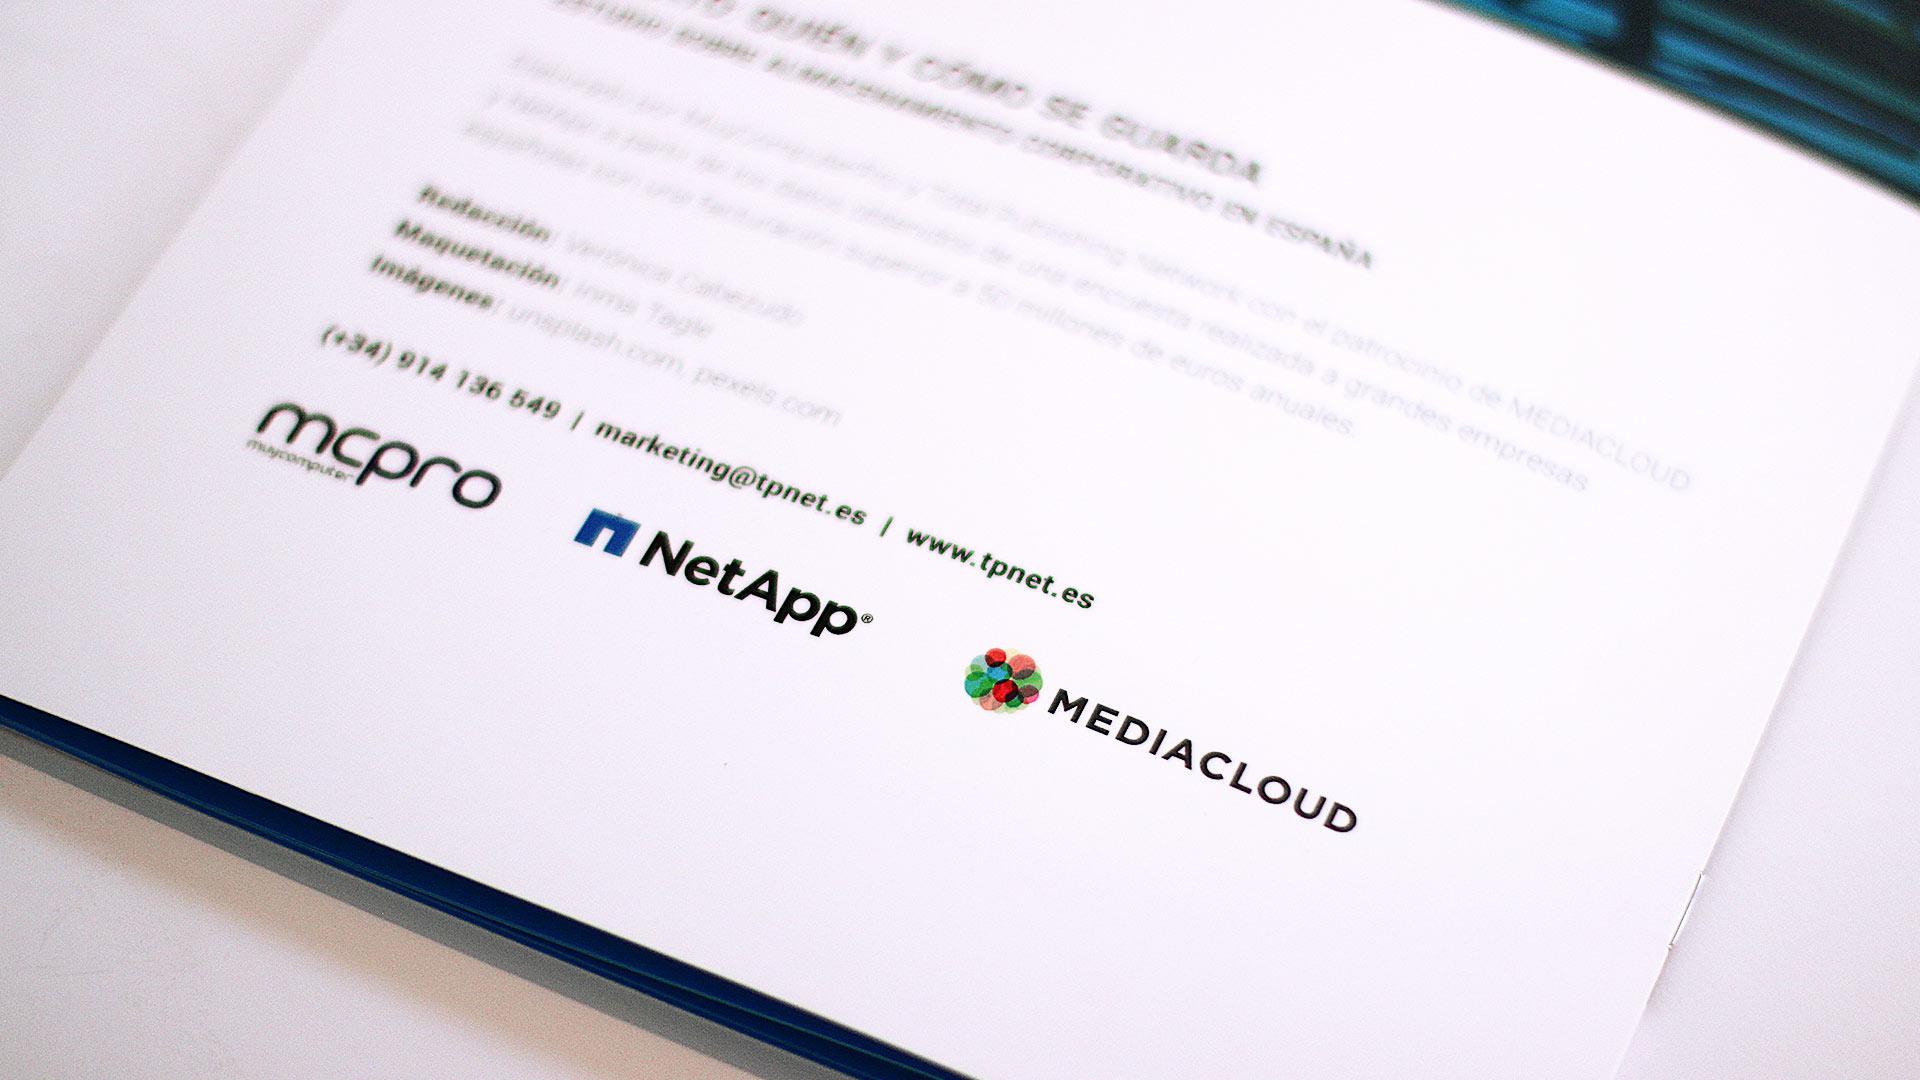 netapp-mediacloud-content-marketing-informe-resumen-ejecutivo-ebook-2017-21